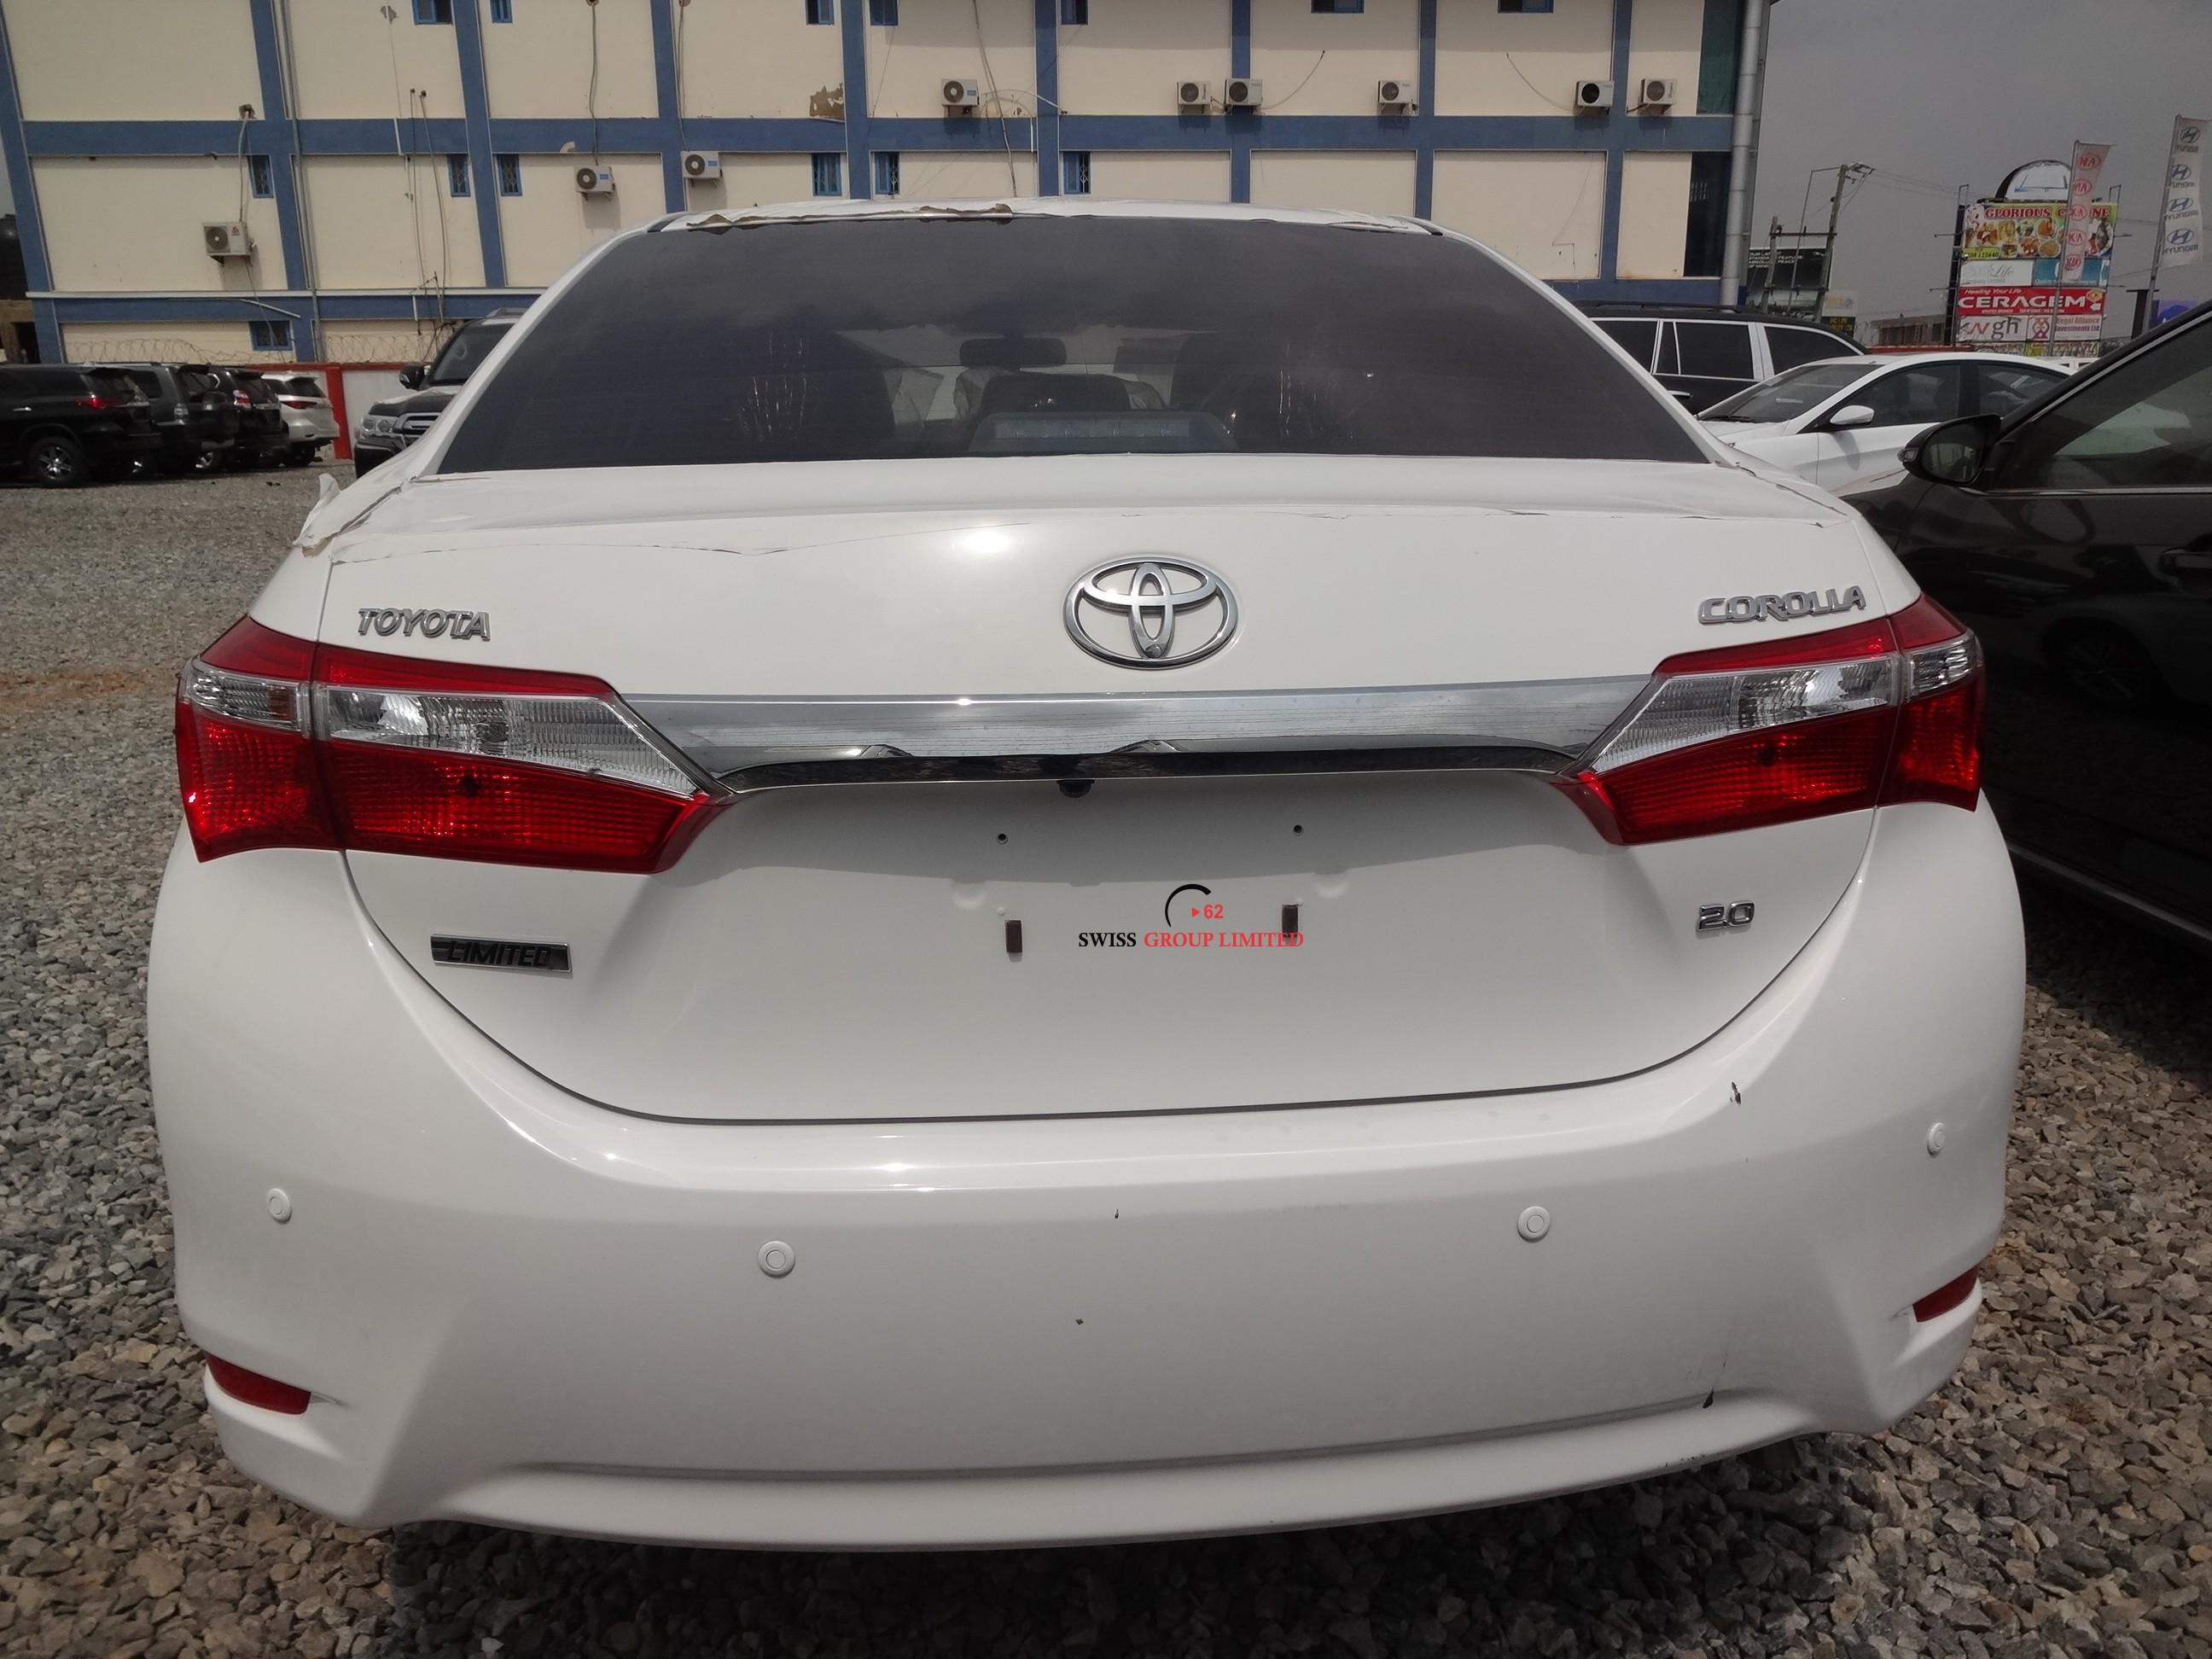 Kekurangan Toyota Corolla 2.0 Spesifikasi